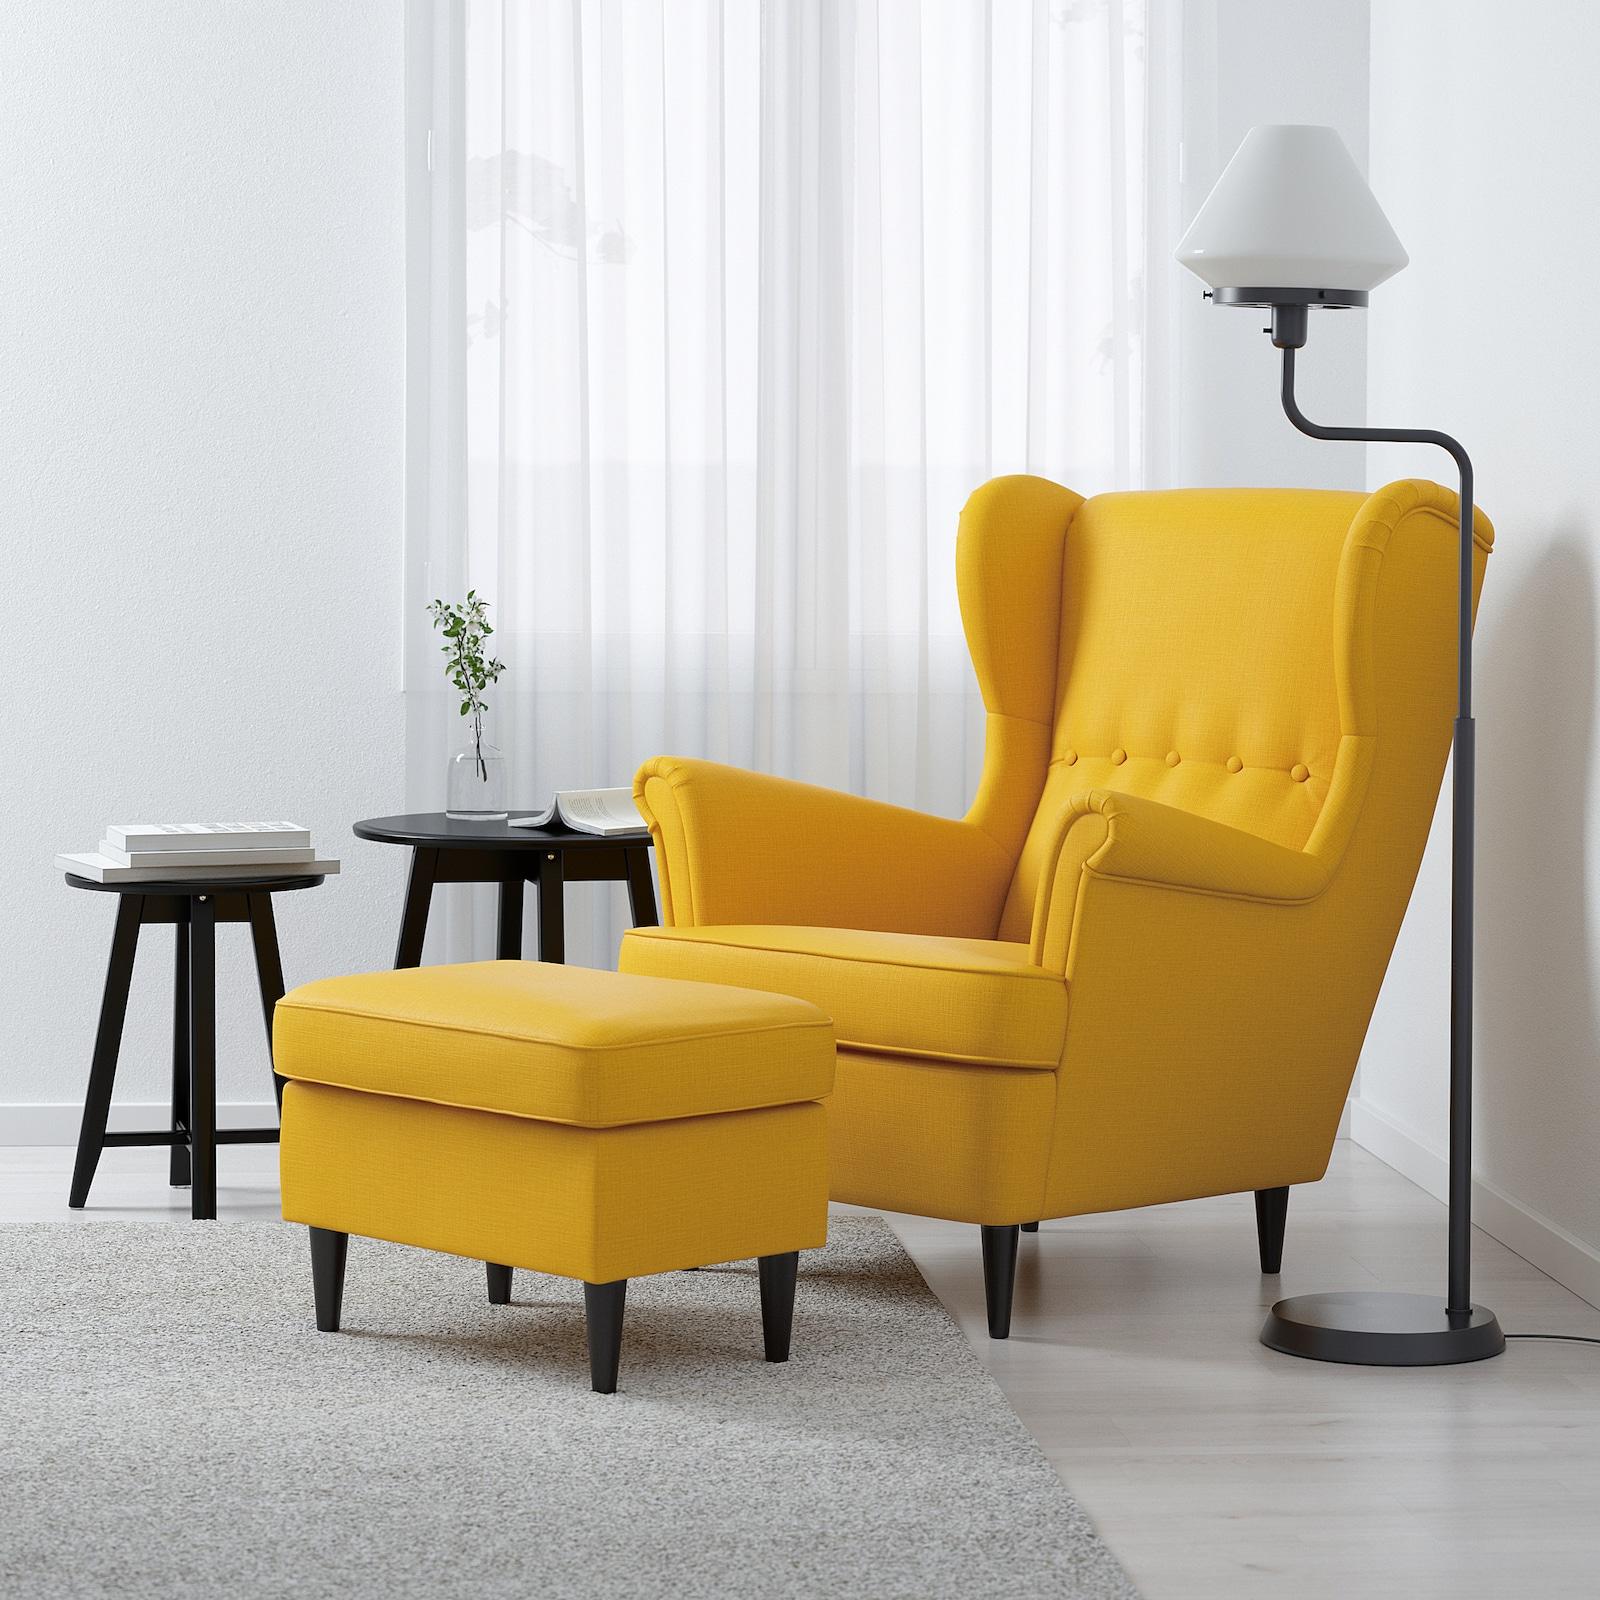 strandmon-fauteuil-a-oreilles-skiftebo-jaune__0837297_pe601176_s5.jpg